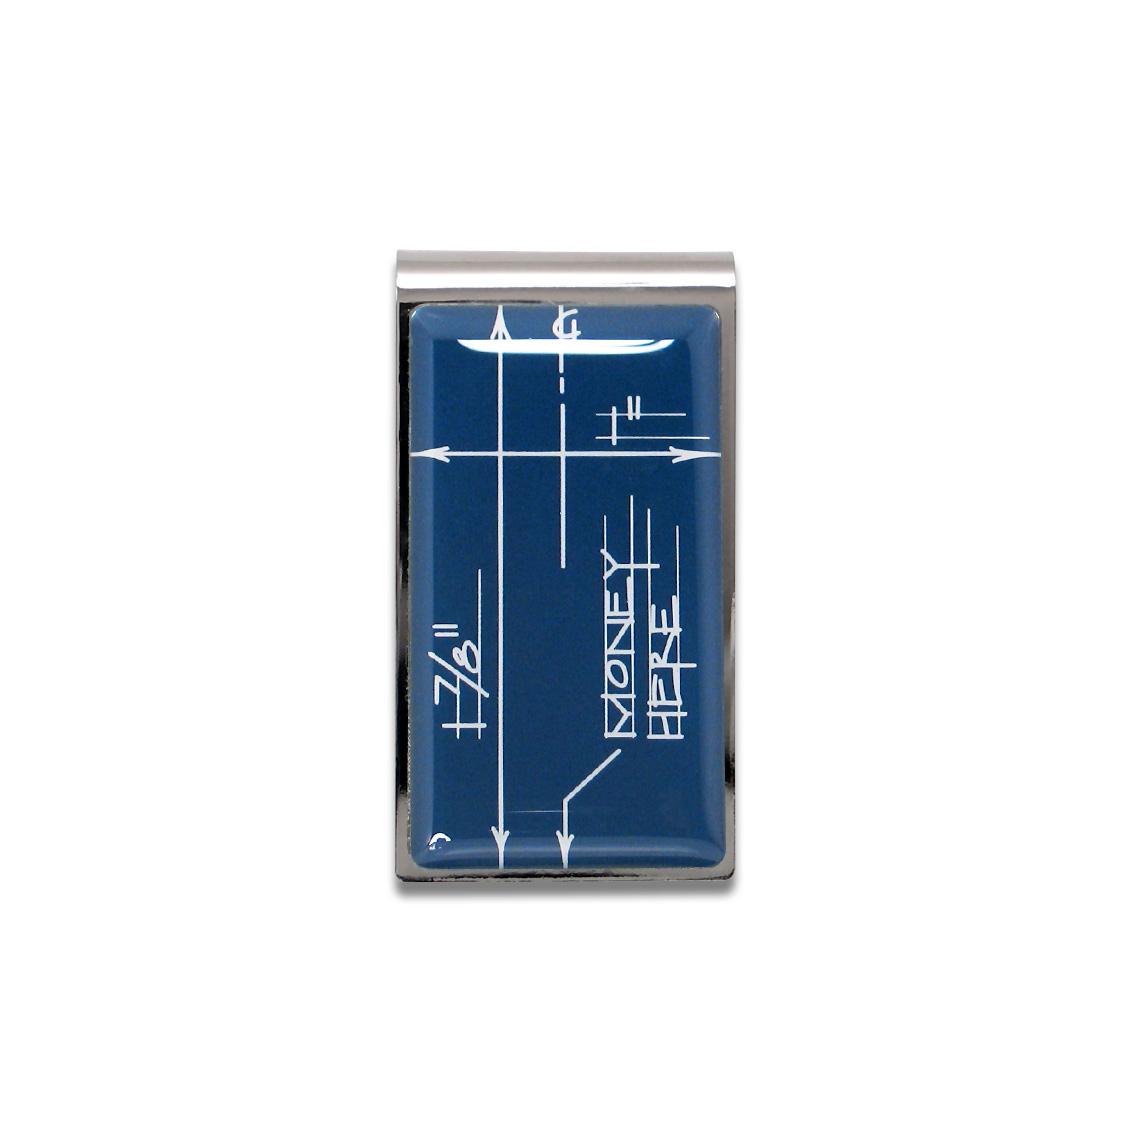 Shop blueprint roller ball pen card case set by constantin boym compatible products acme studio pen malvernweather Image collections